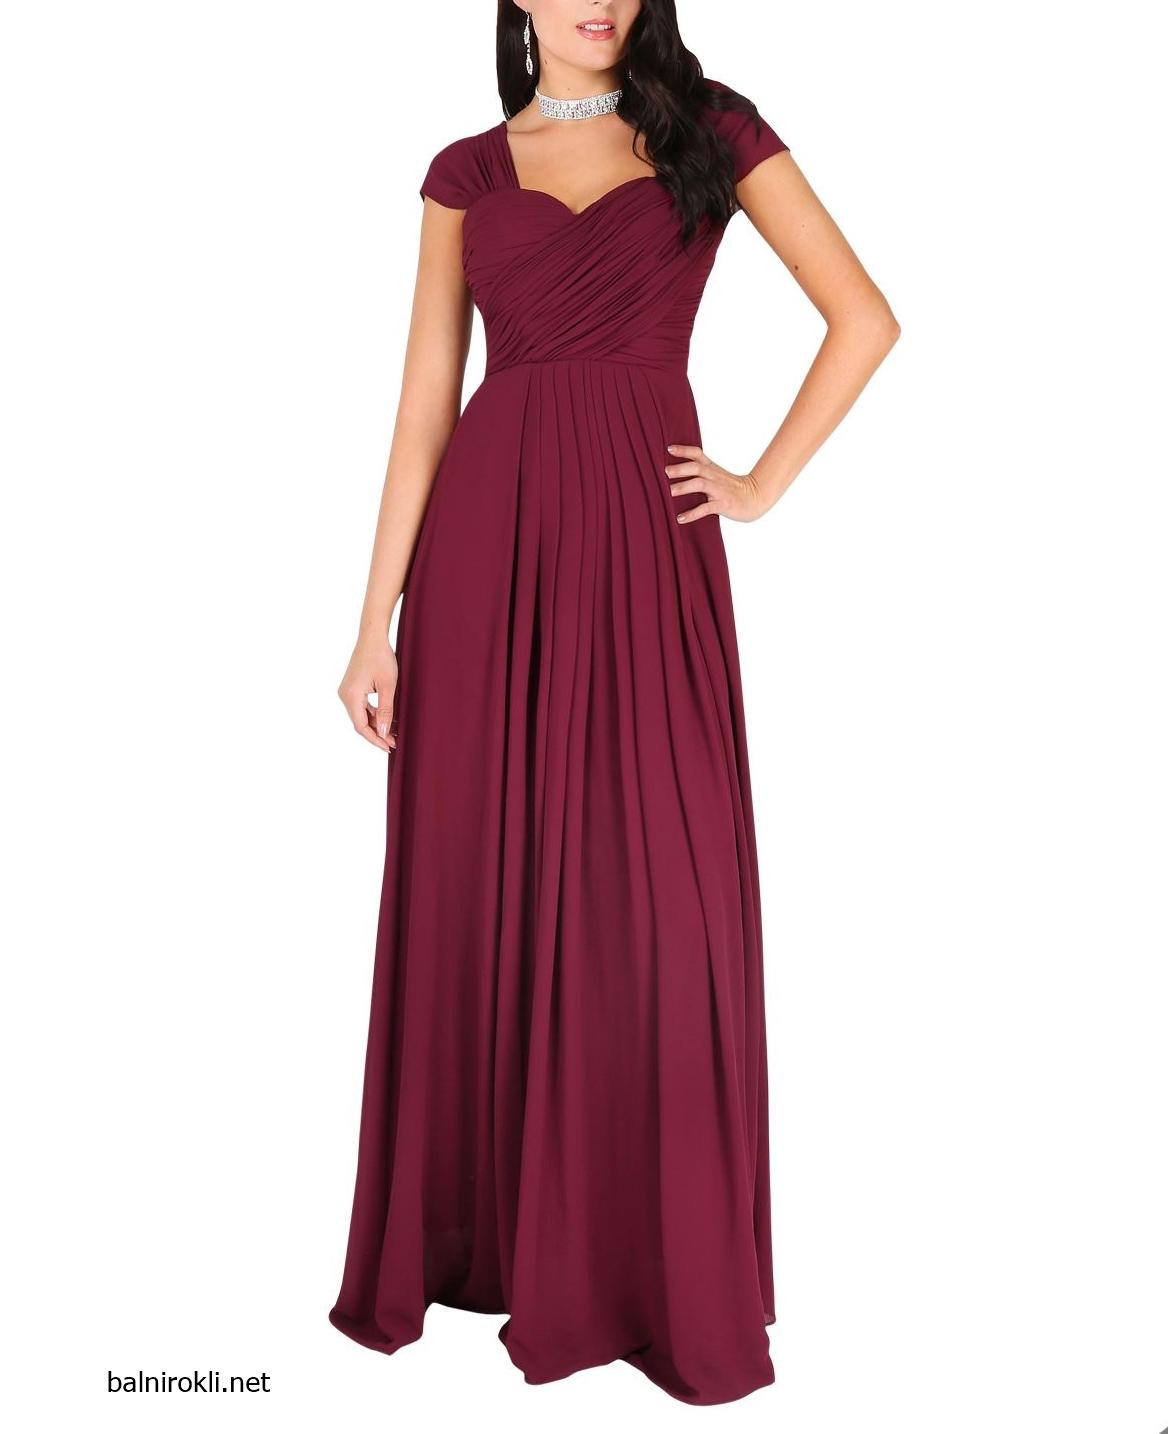 елегантна официална рокля бордо